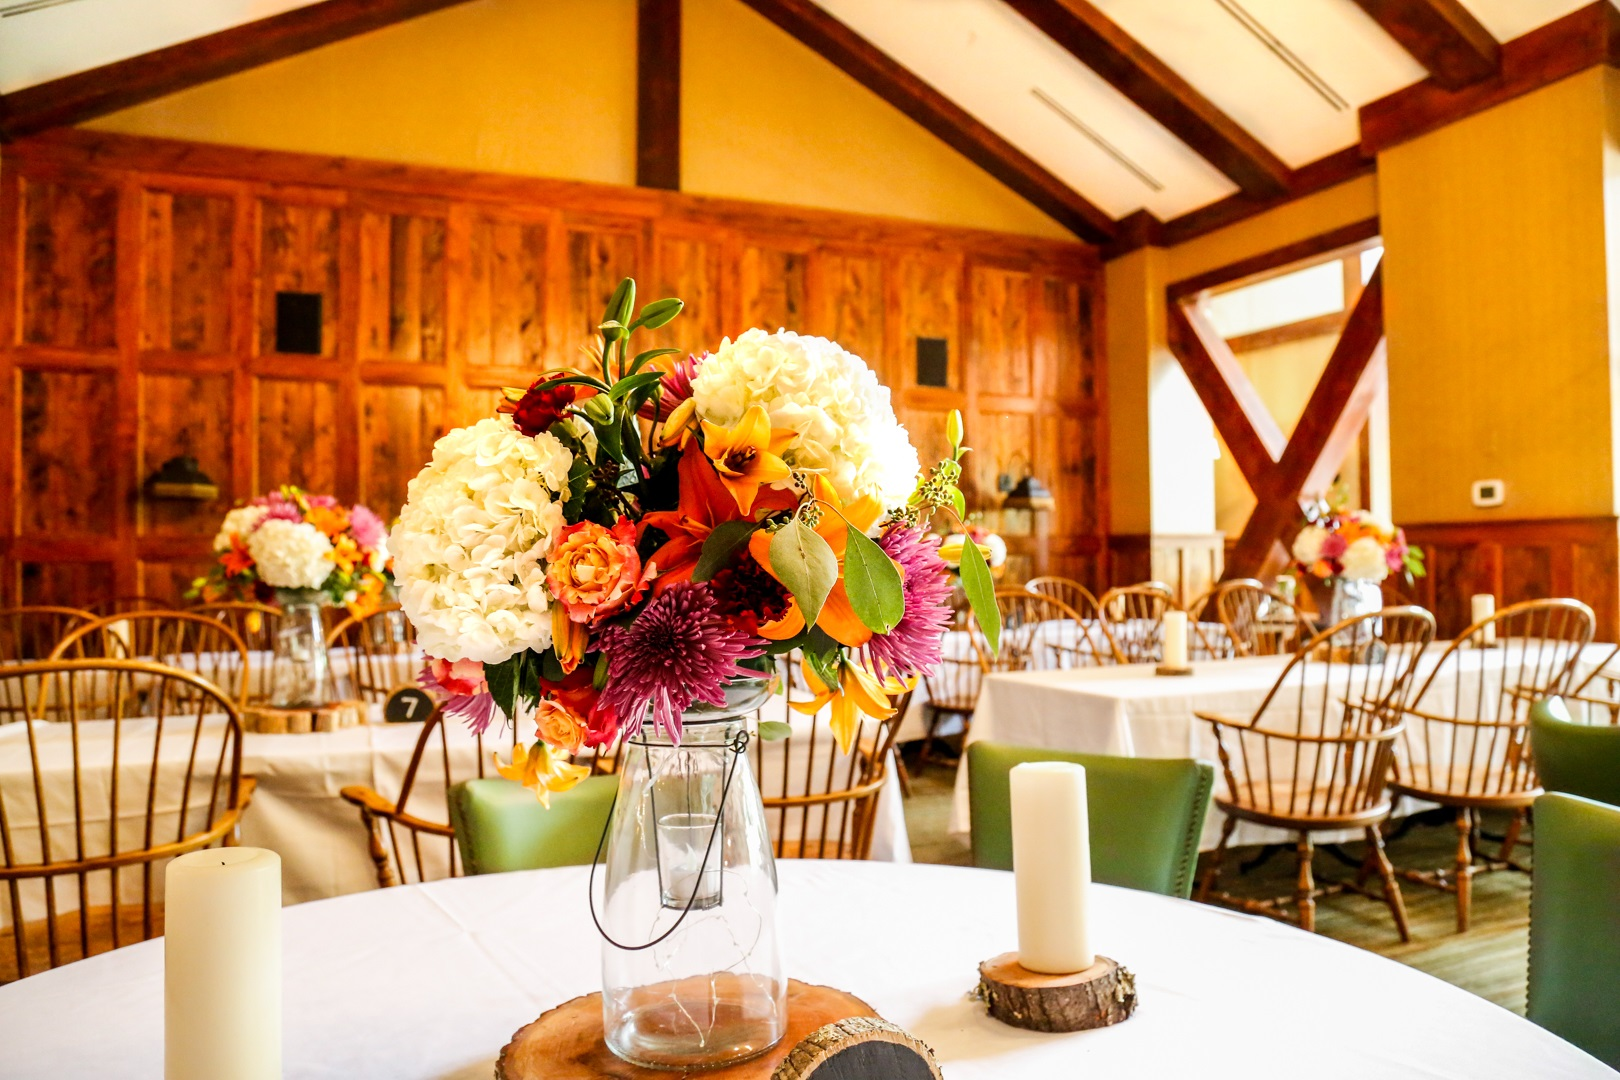 Wedding Flowers on table.jpg